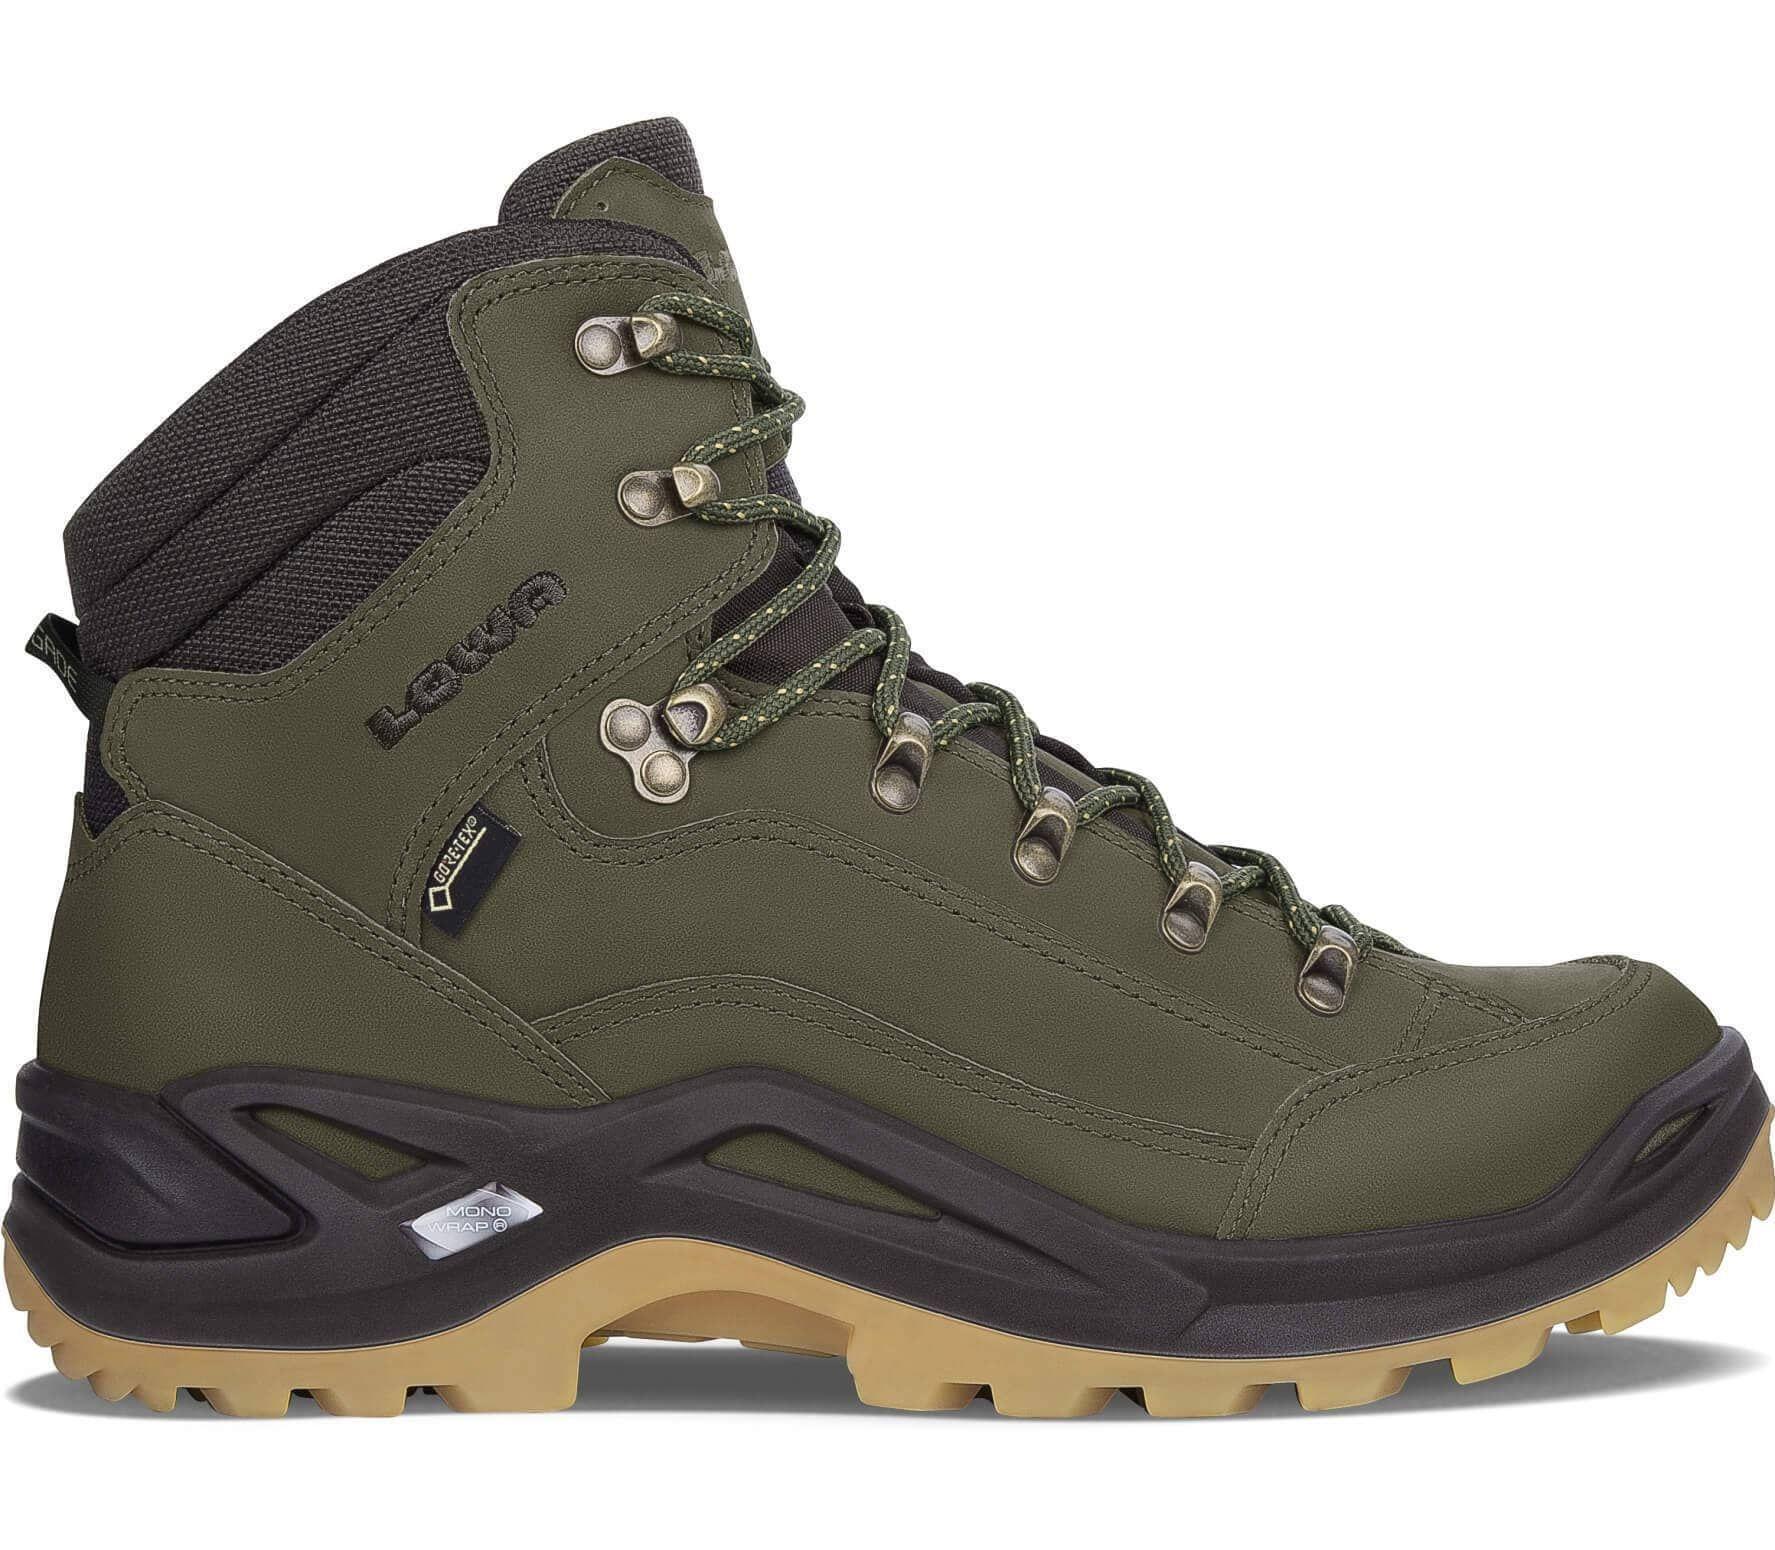 Men's ShoesgreenbrownIn Mid Lowa Hiking Renegade Gtx DYE2bWH9Ie